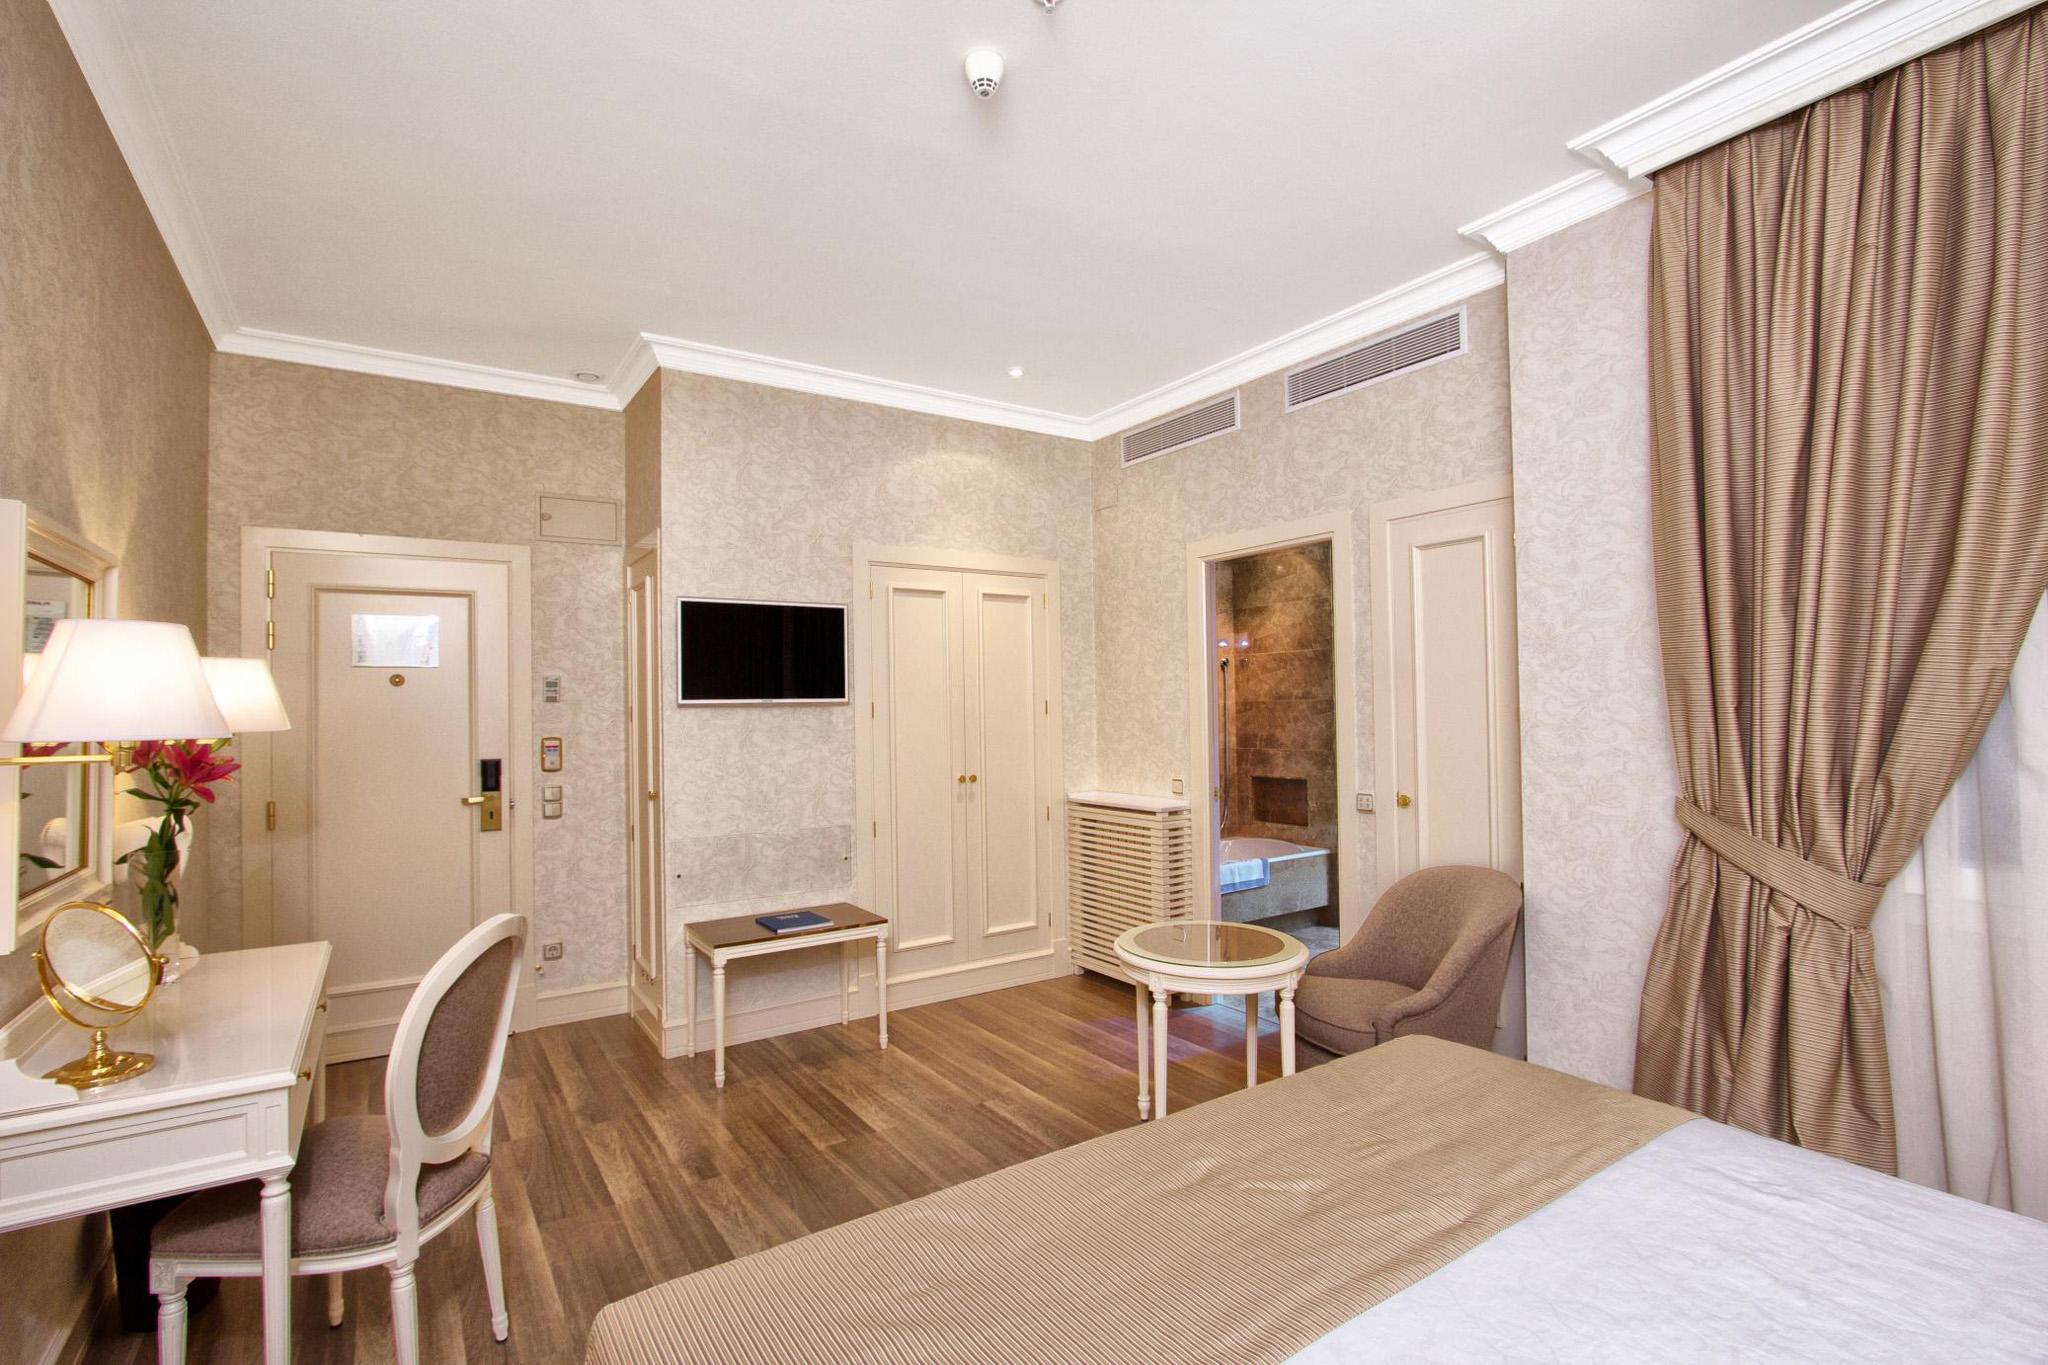 Habitaciones dobles superiores Hotel Atlntico Madrid